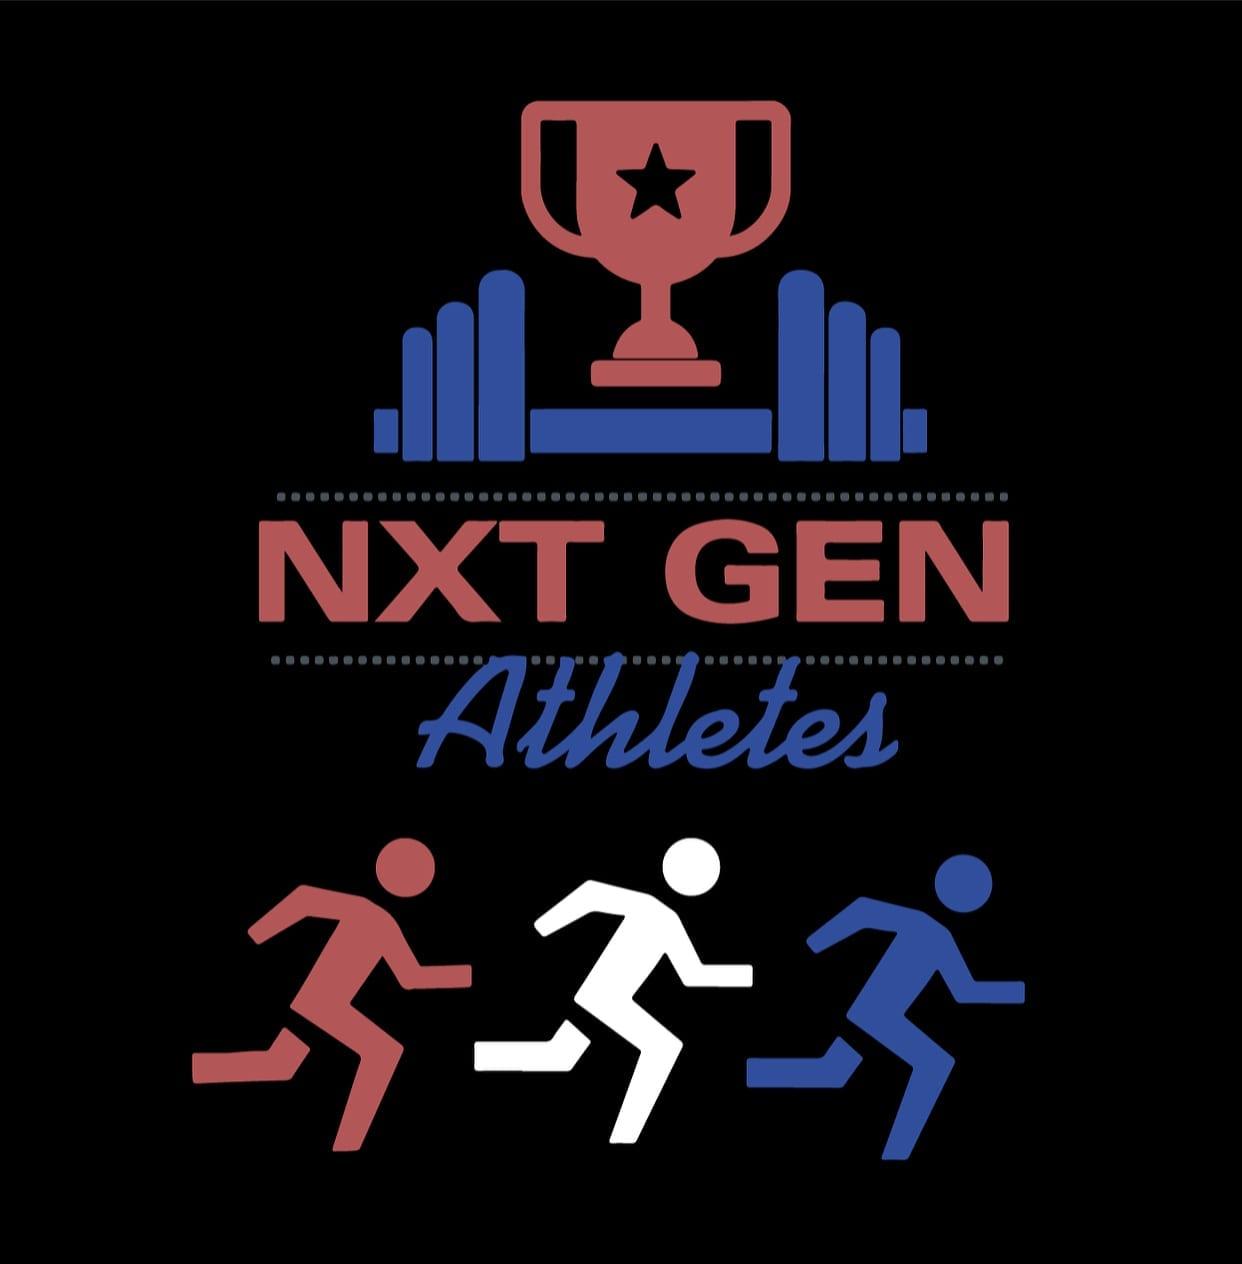 NXT generation athletes